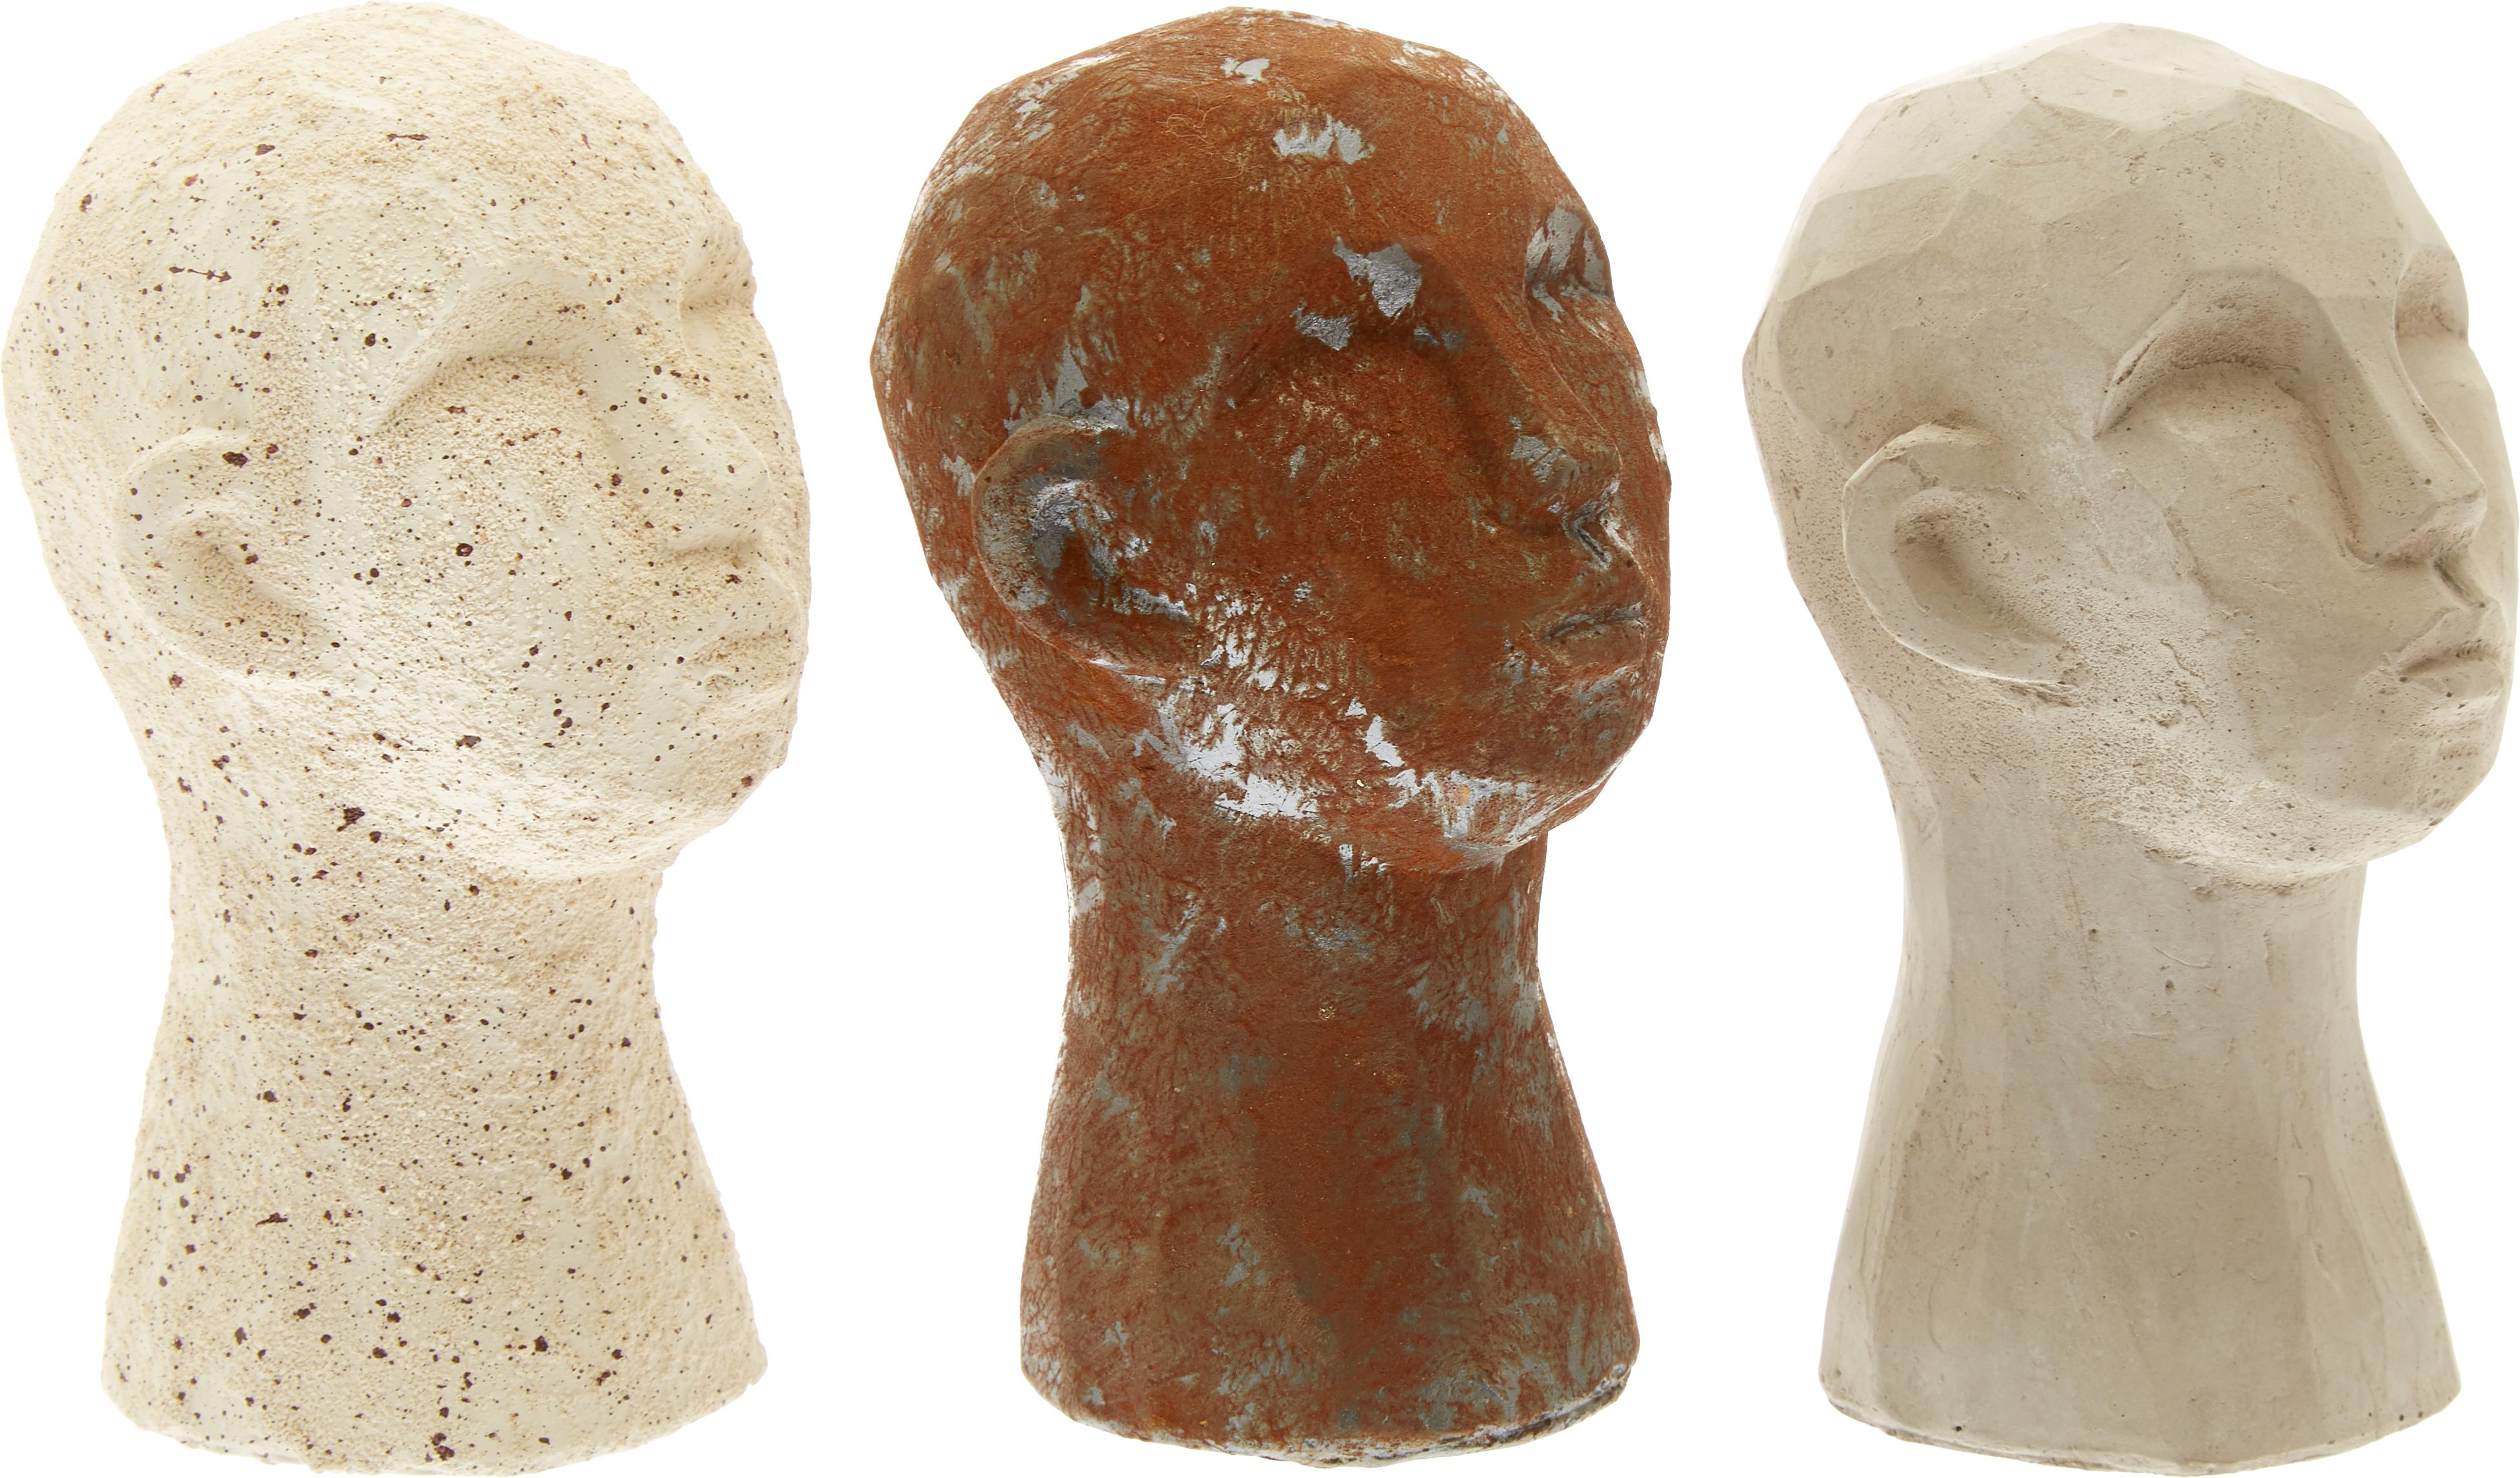 Deko-Objekte-Set Figure Head, 3-tlg. , Beton, Weiss, Braun, Grau, Ø 9 x H 15 cm